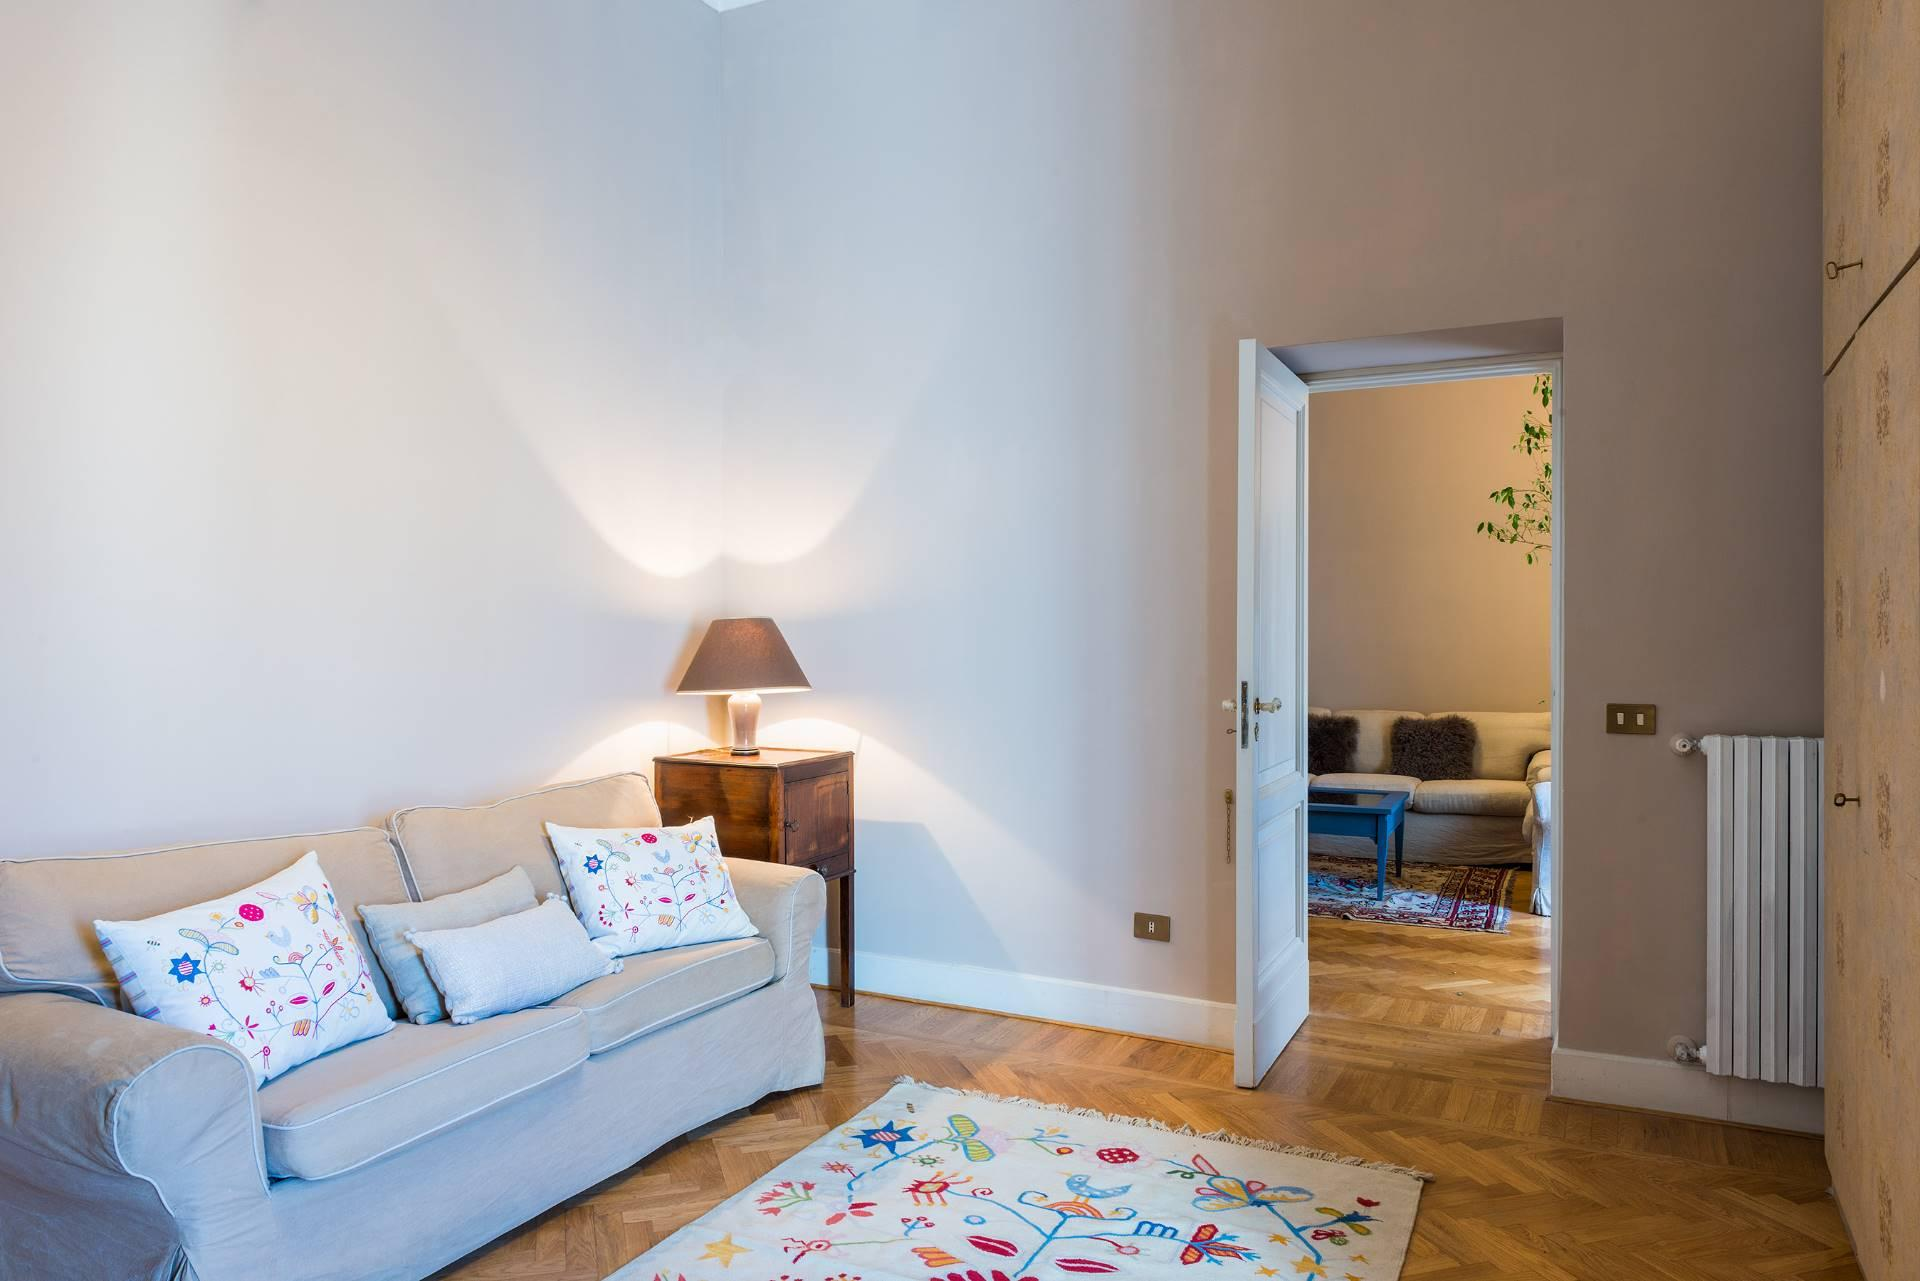 Stylish apartment with seaviews - 18